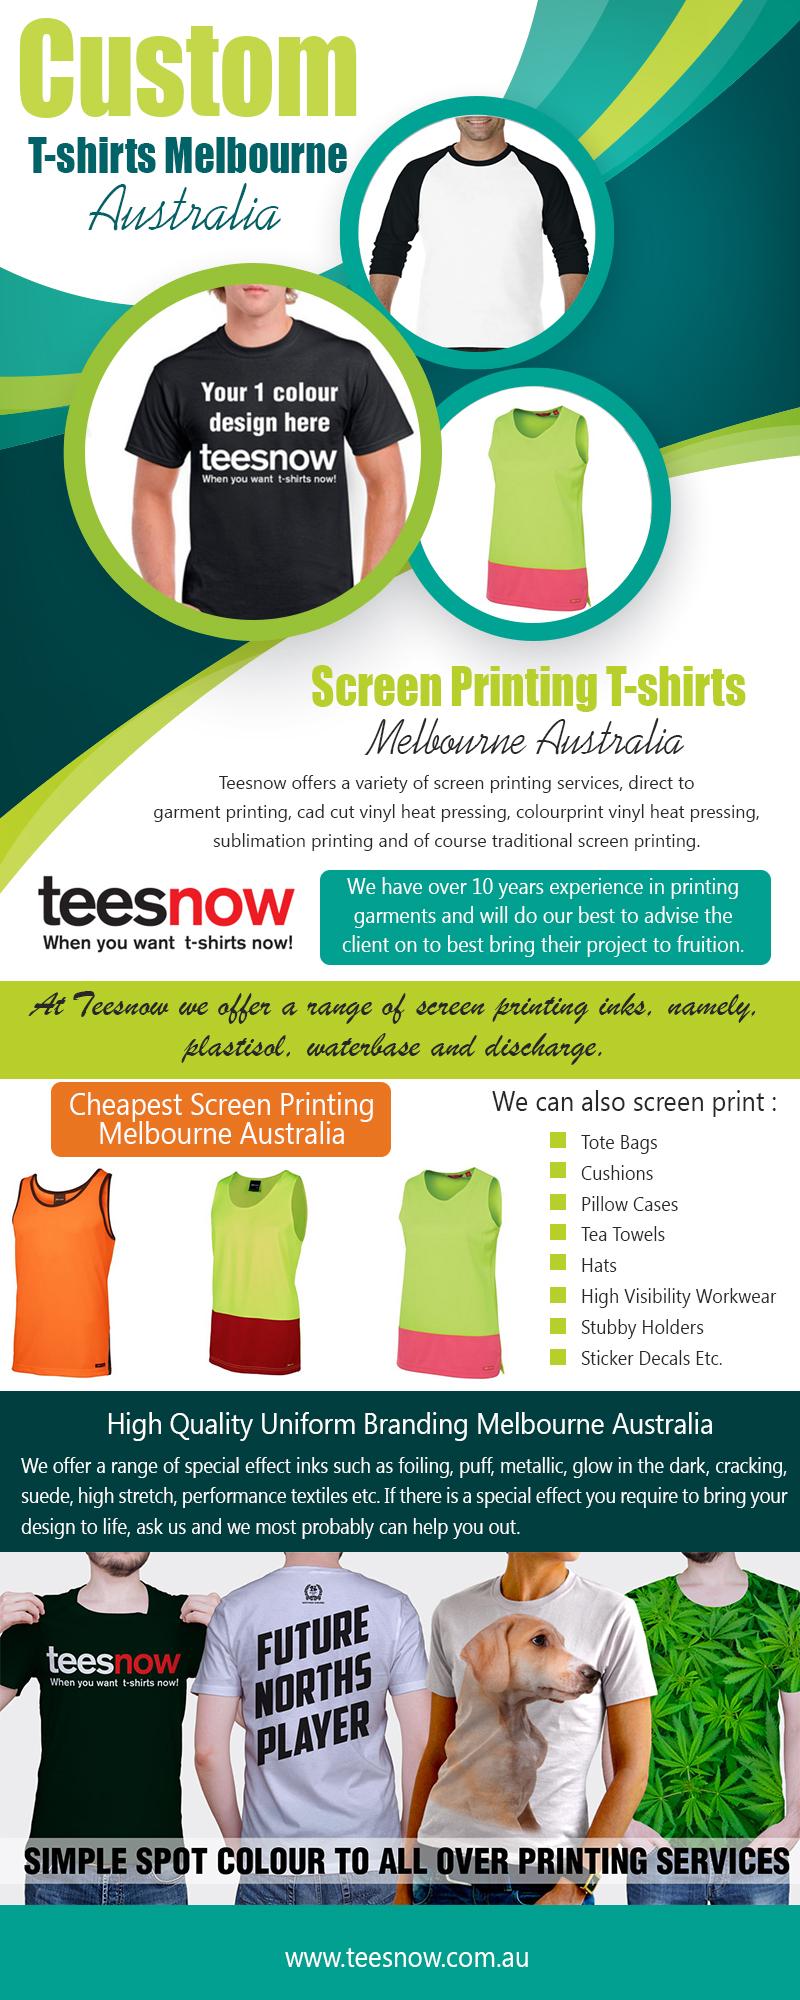 Custom T-Shirts Melbourne https://www.teesnow.com.au/